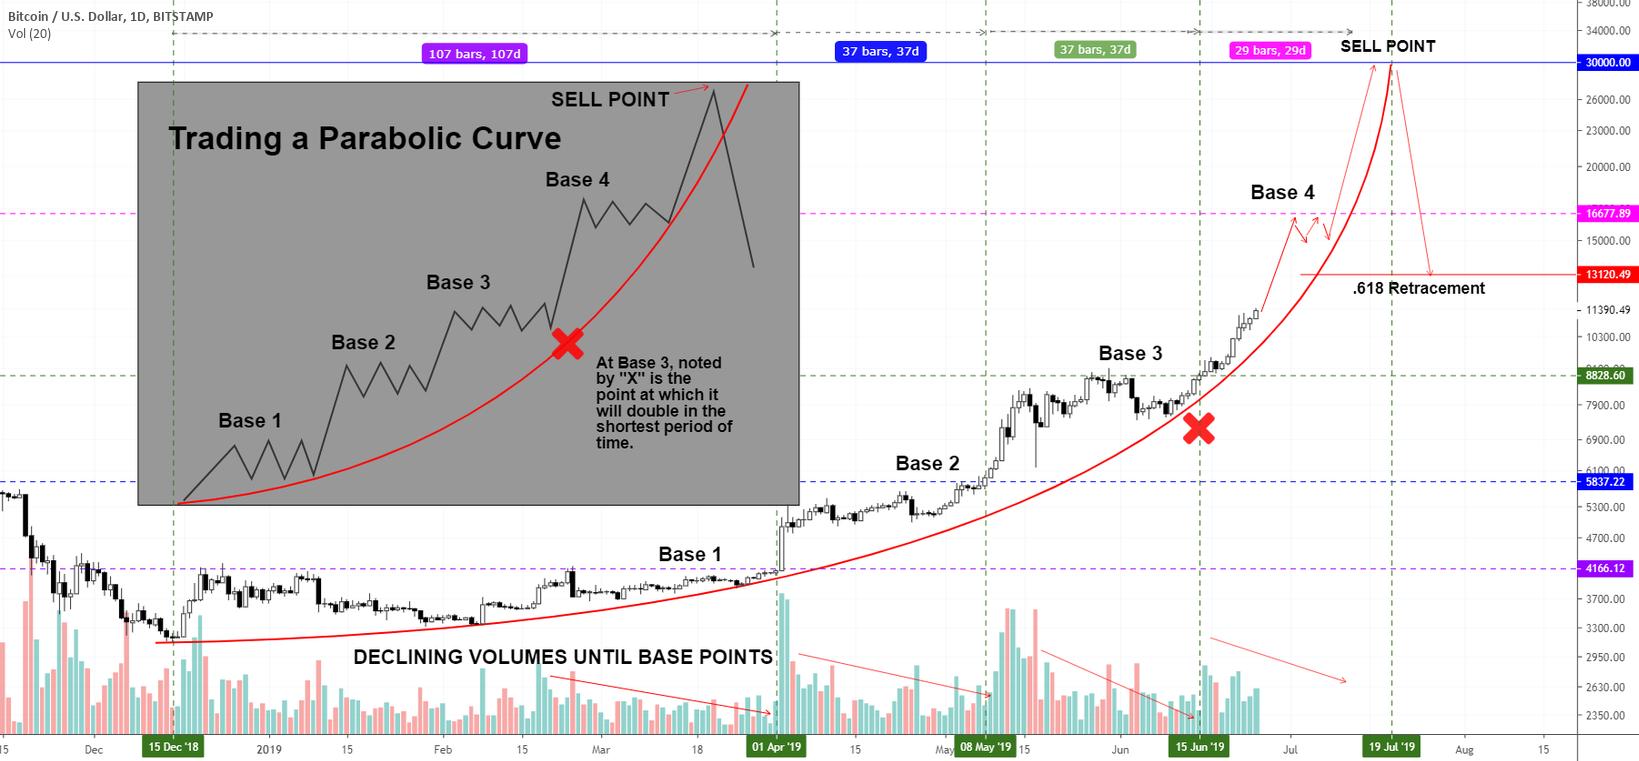 Bitcoins go parabolic mirror las vegas betting wikipedia